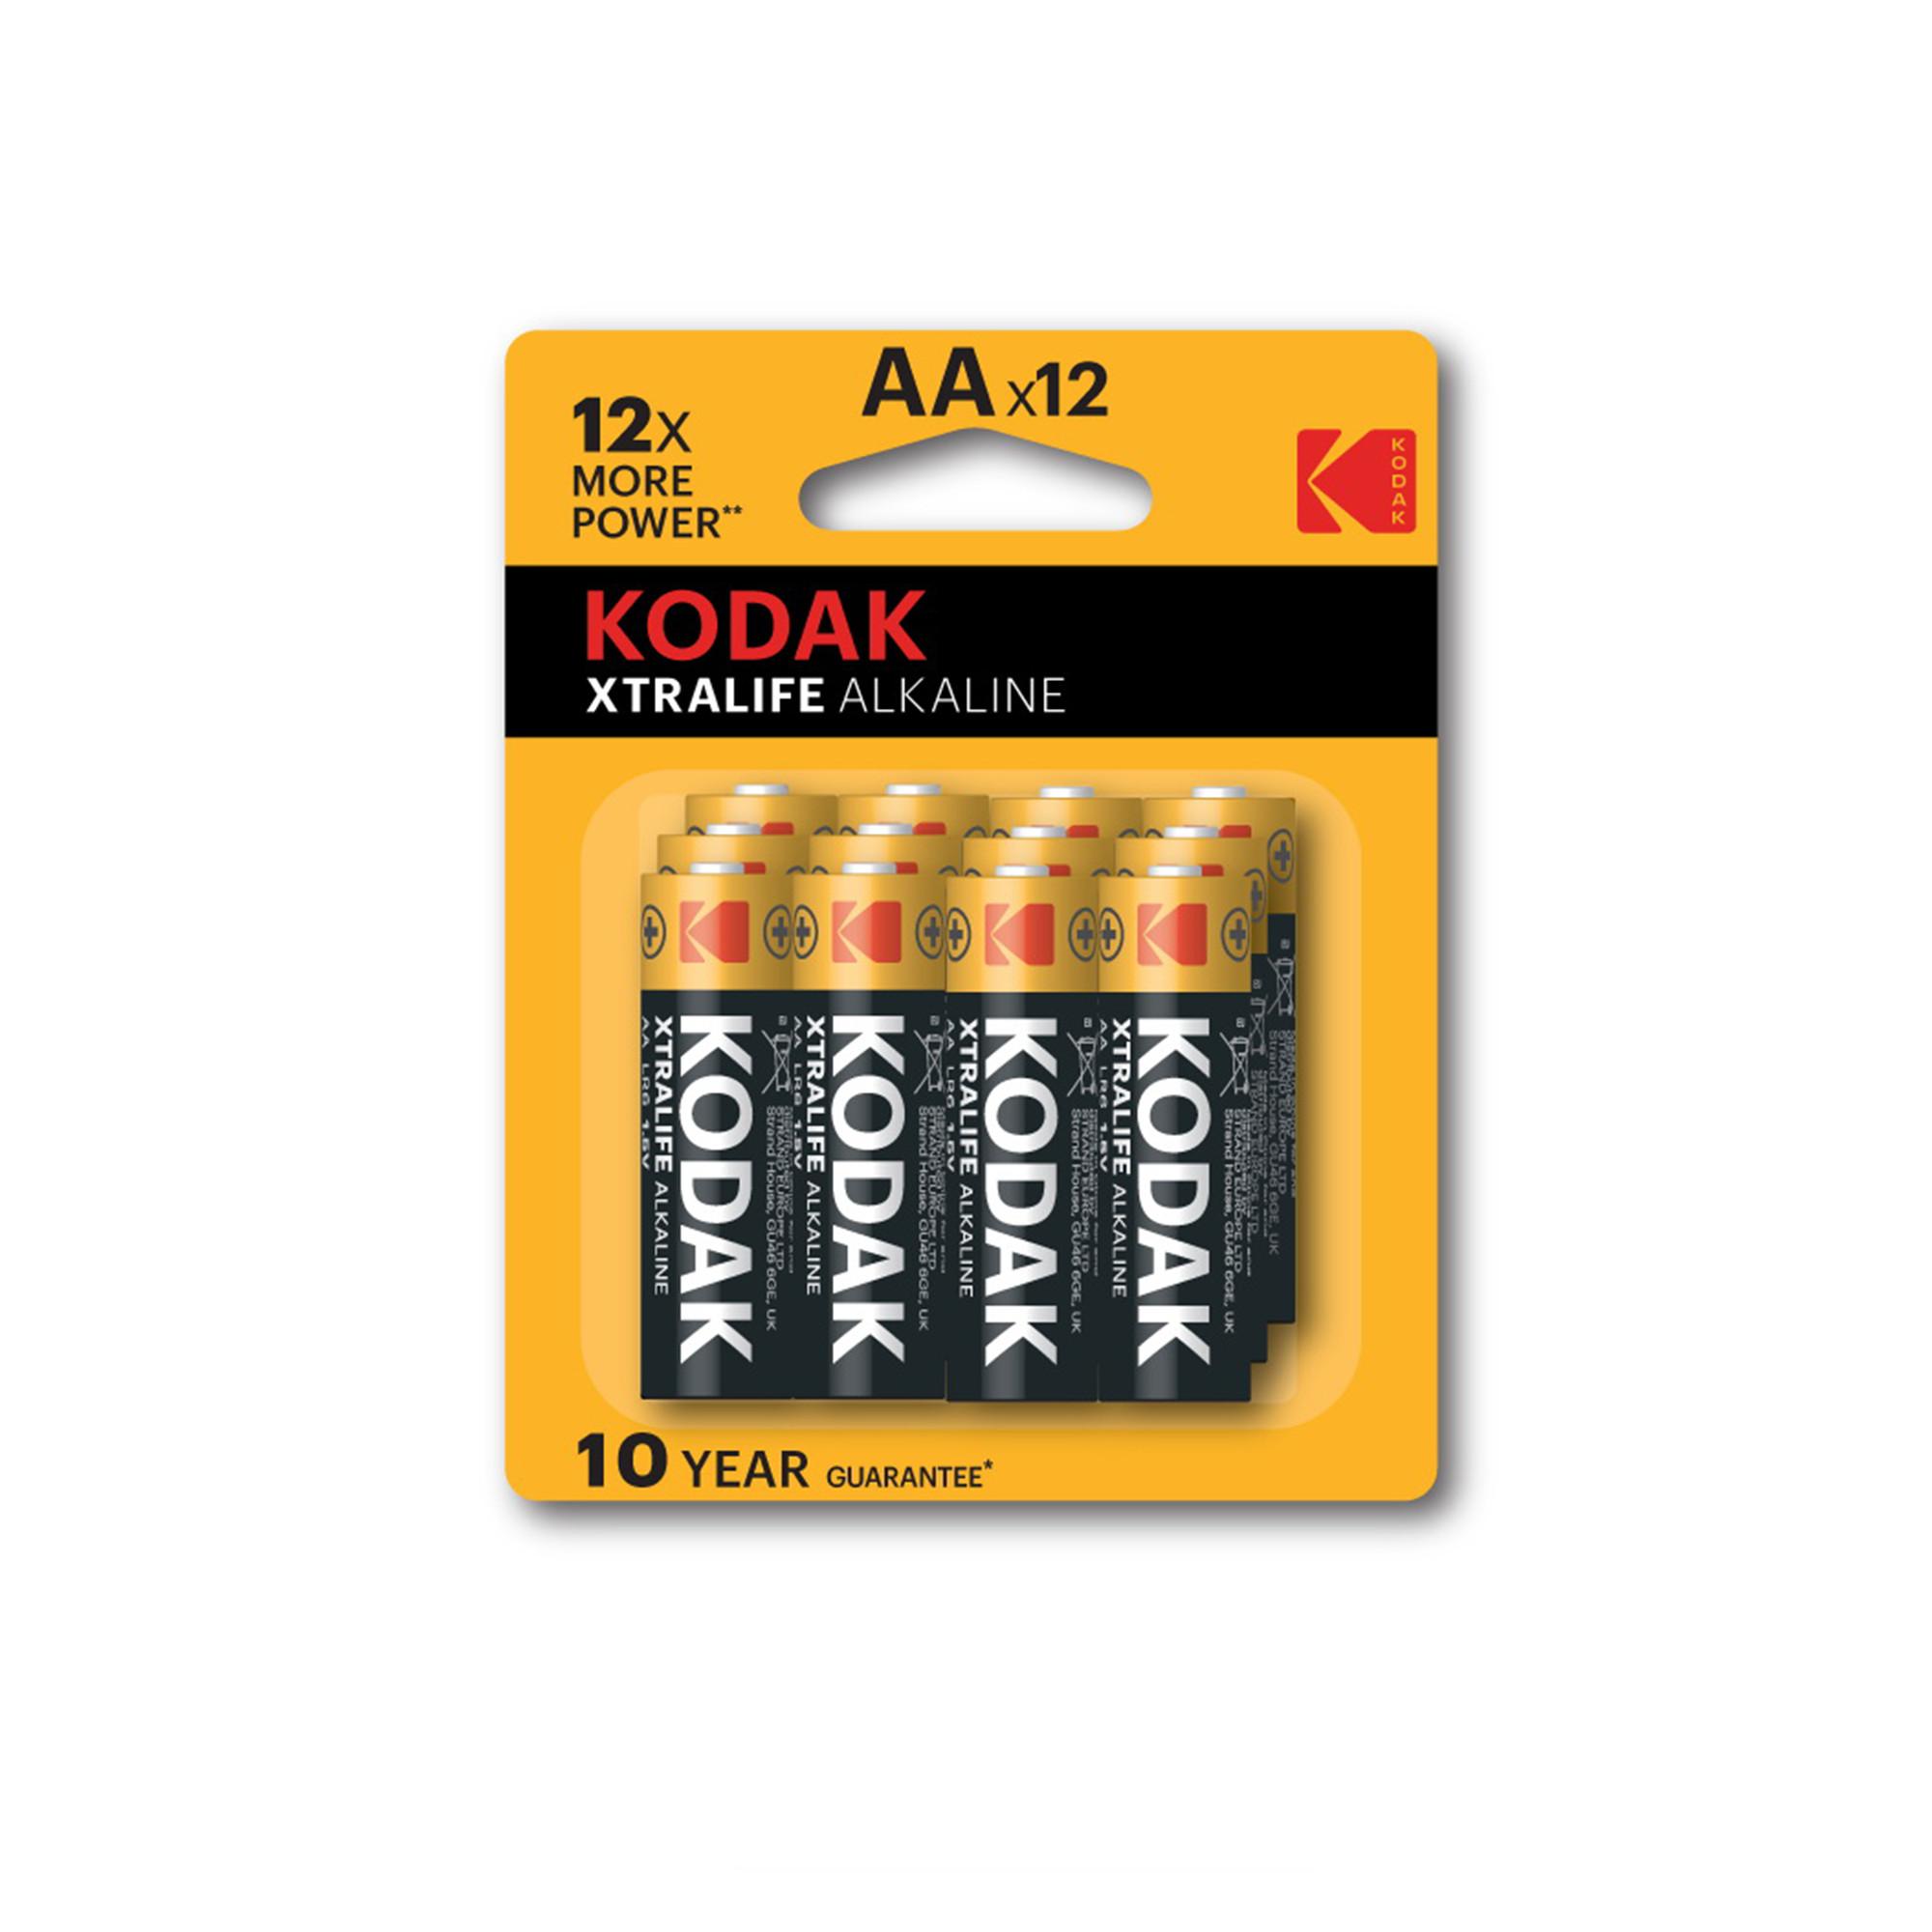 Bộ 12 Pin Kodak Alkaline AA UBL IB0219